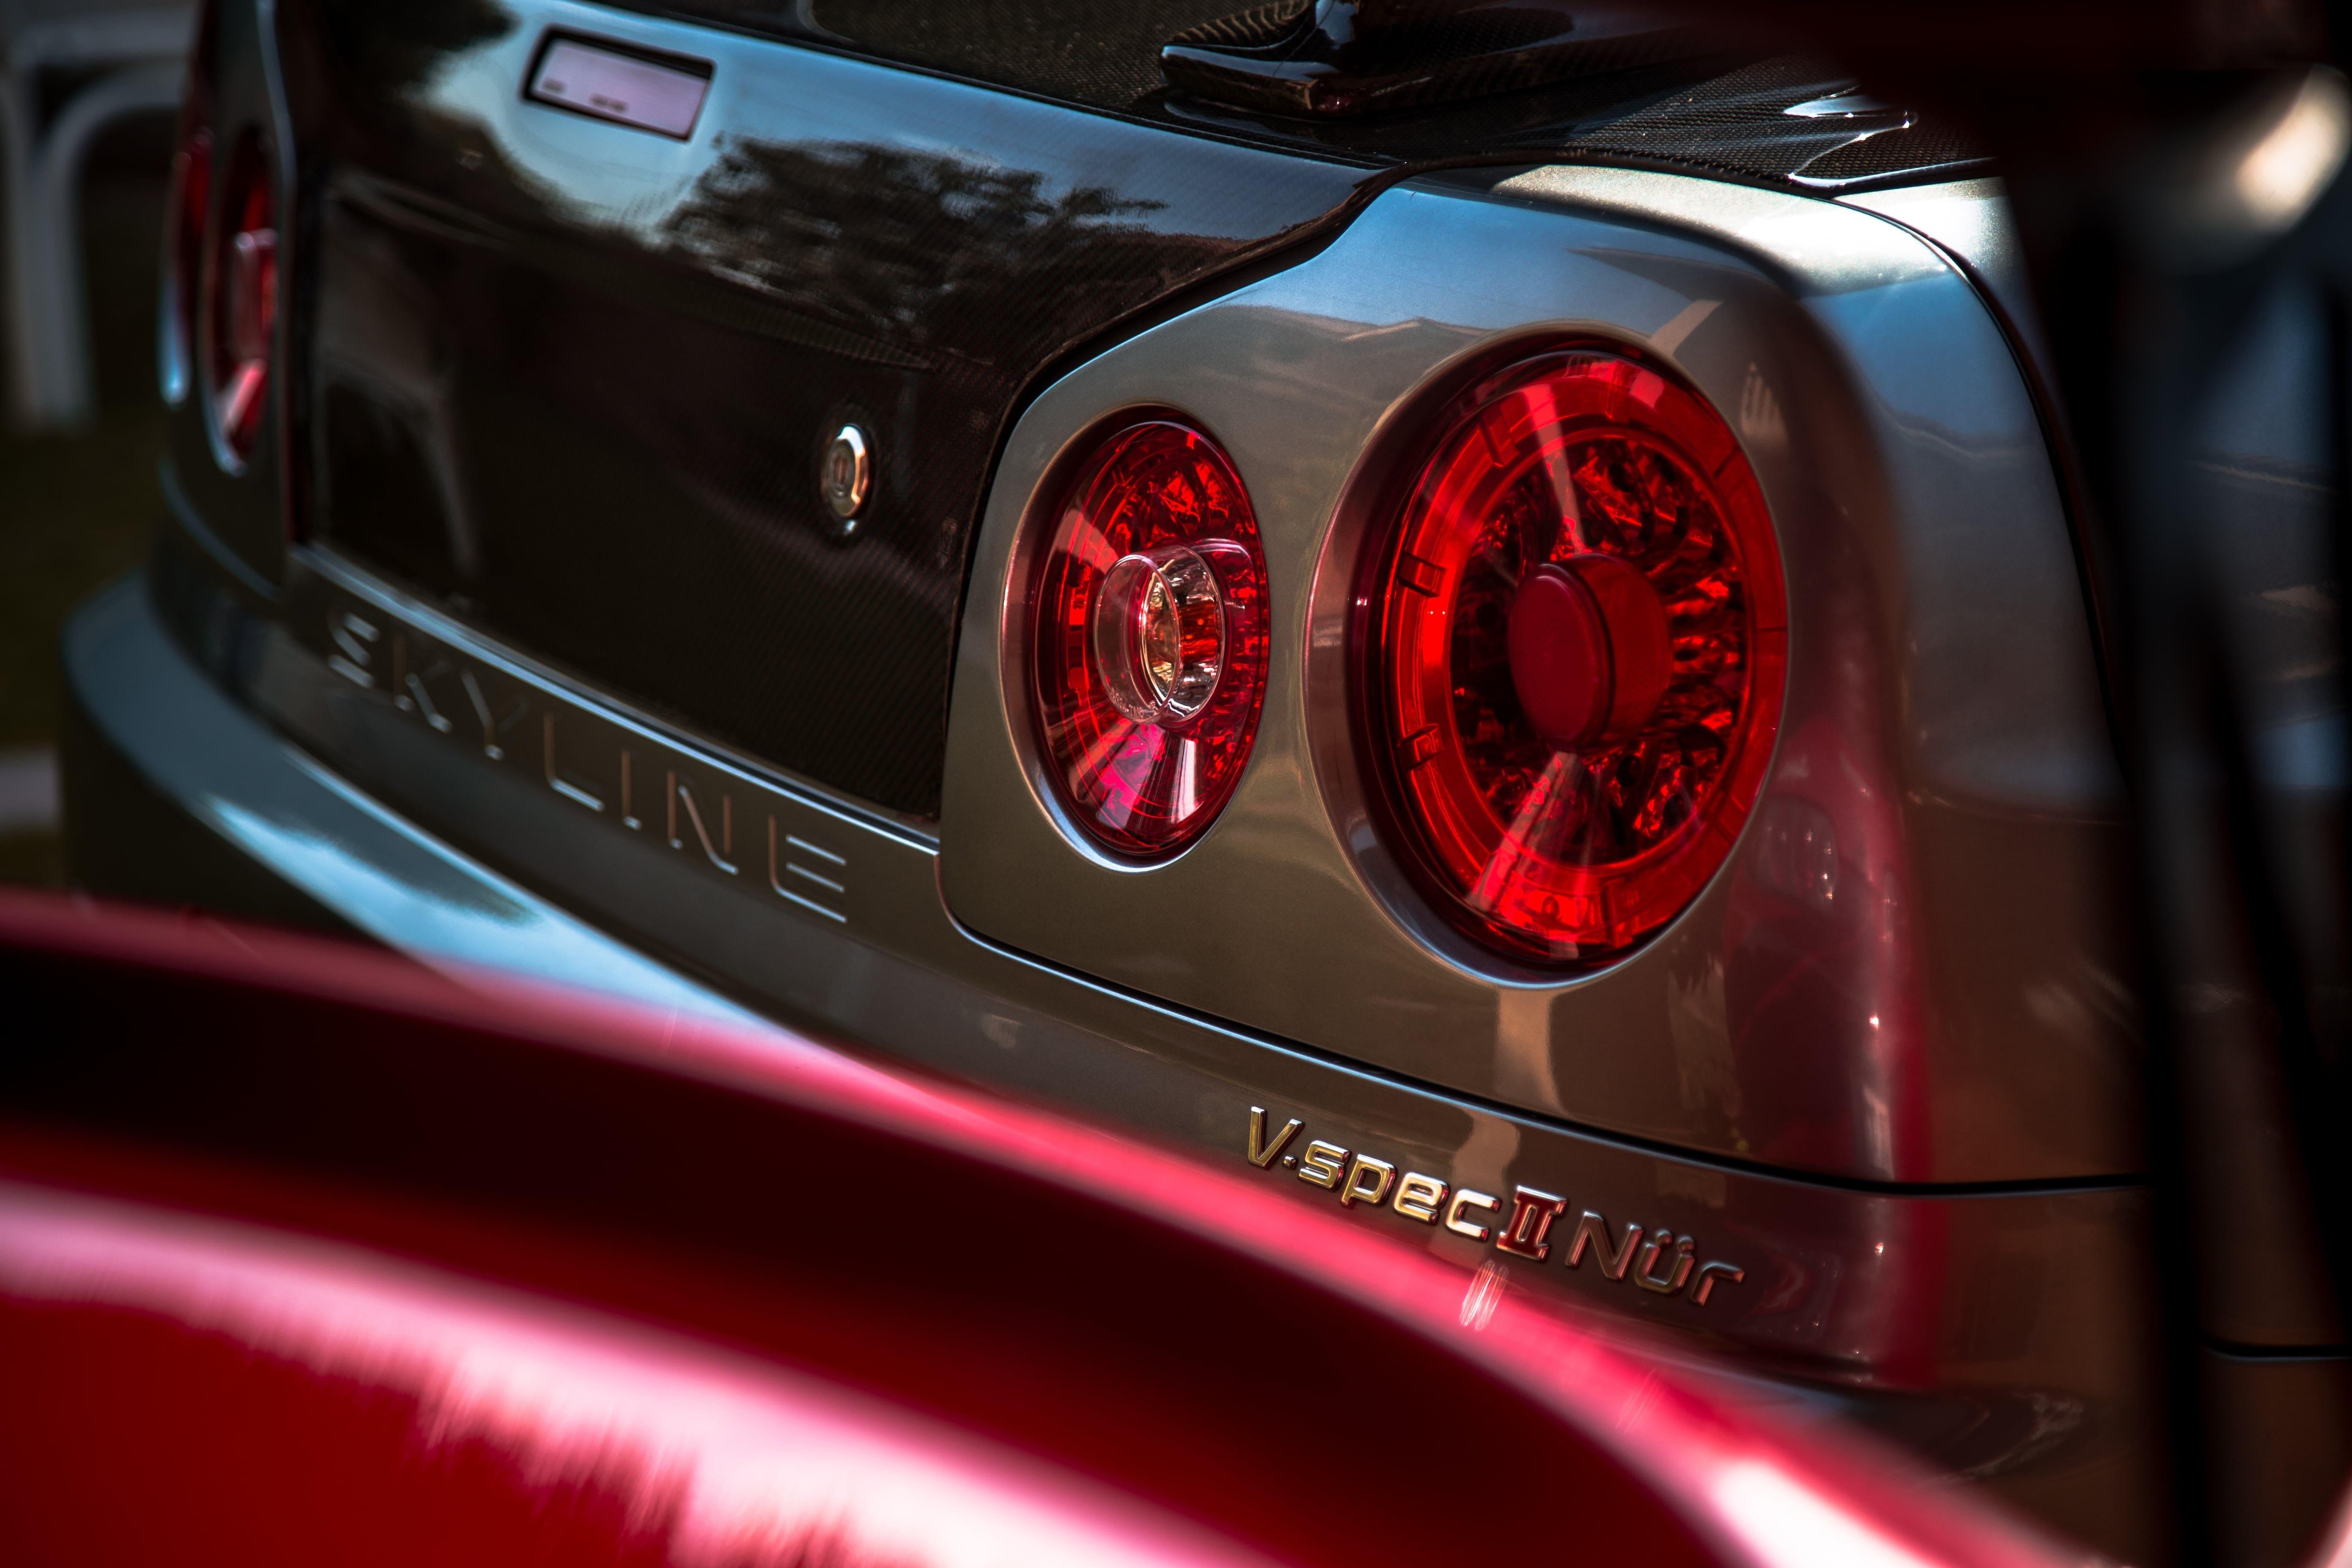 Nissan Skyline GT-R Tail Lights